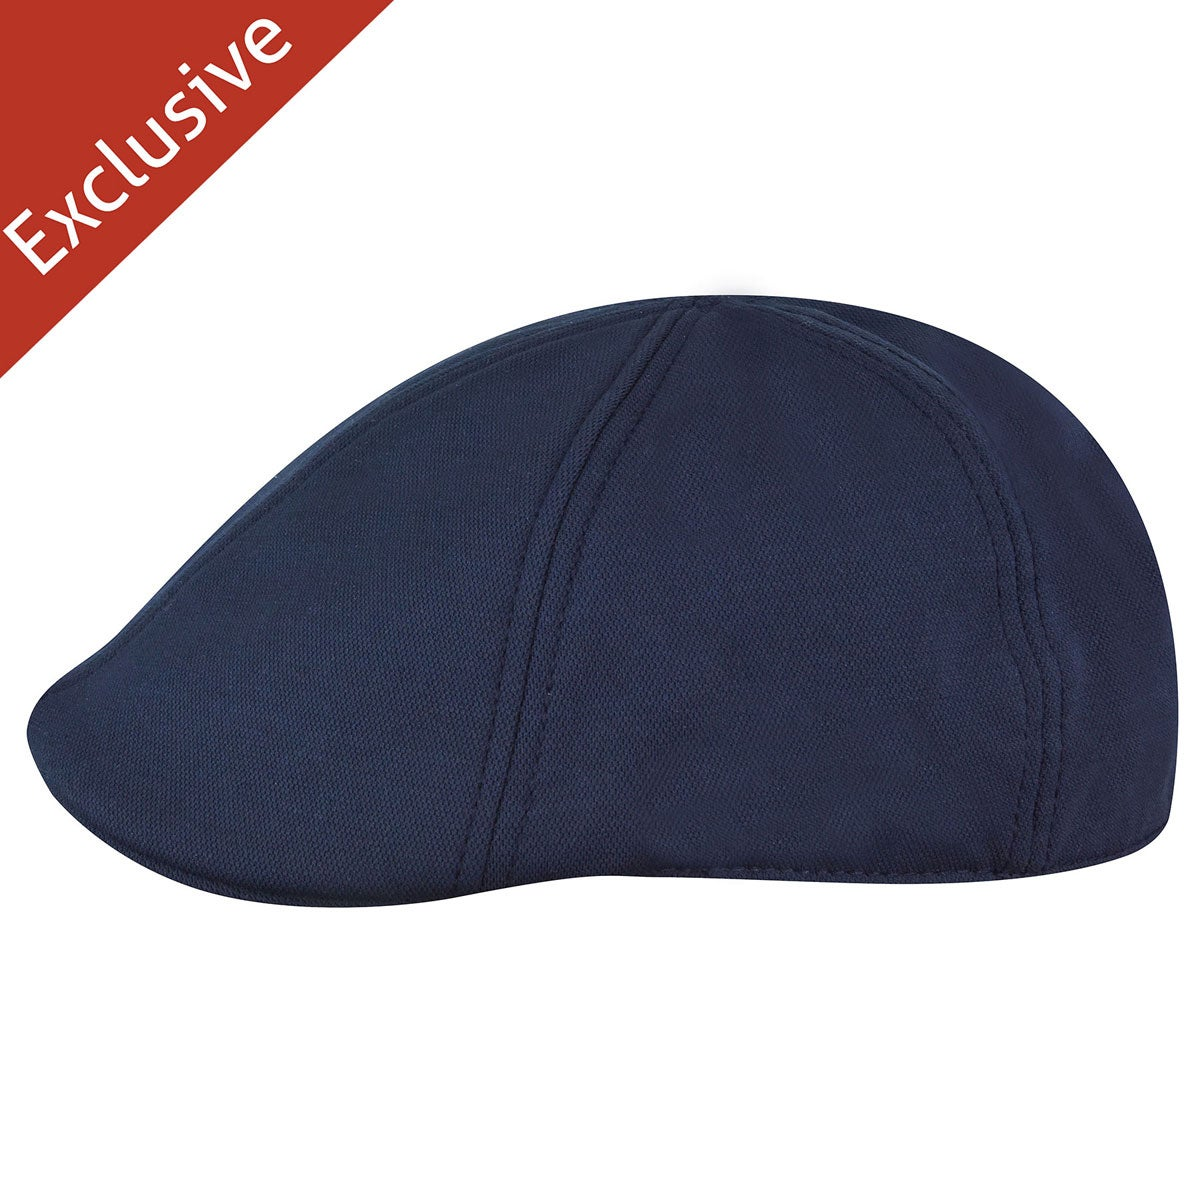 Hats.com Boris Flex Bamboo Cap in Navy